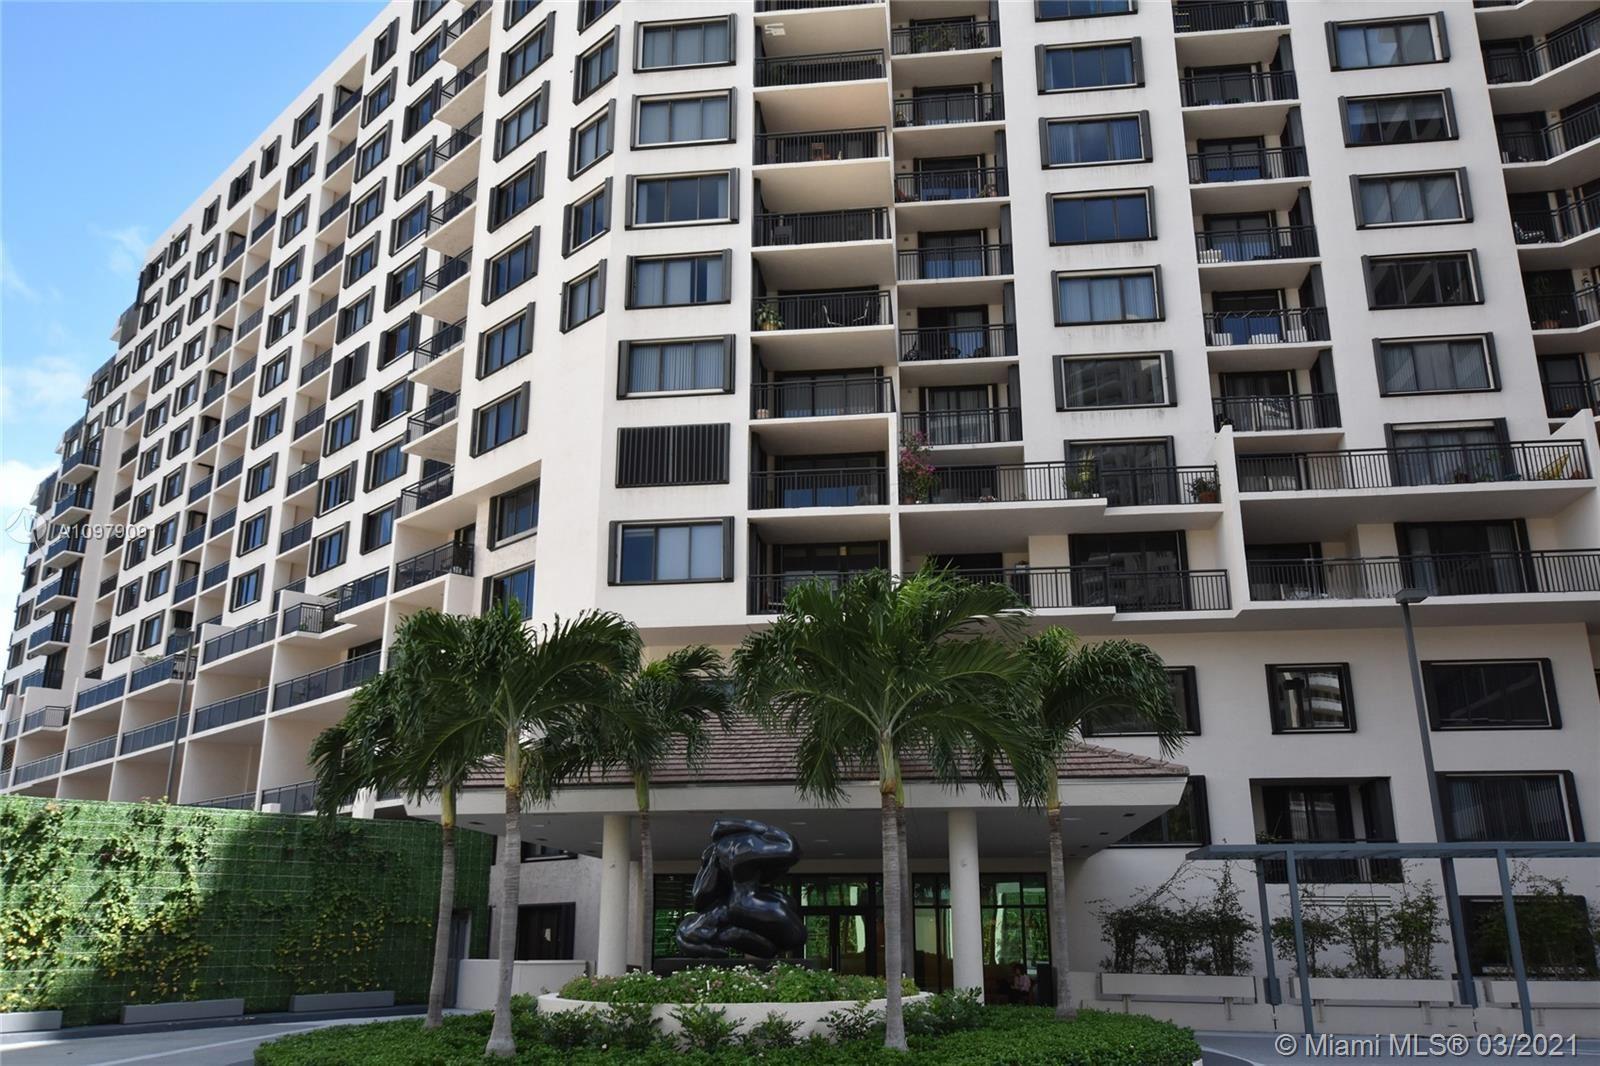 540 Brickell Key Dr #406, Miami, FL 33131 - #: A10979091